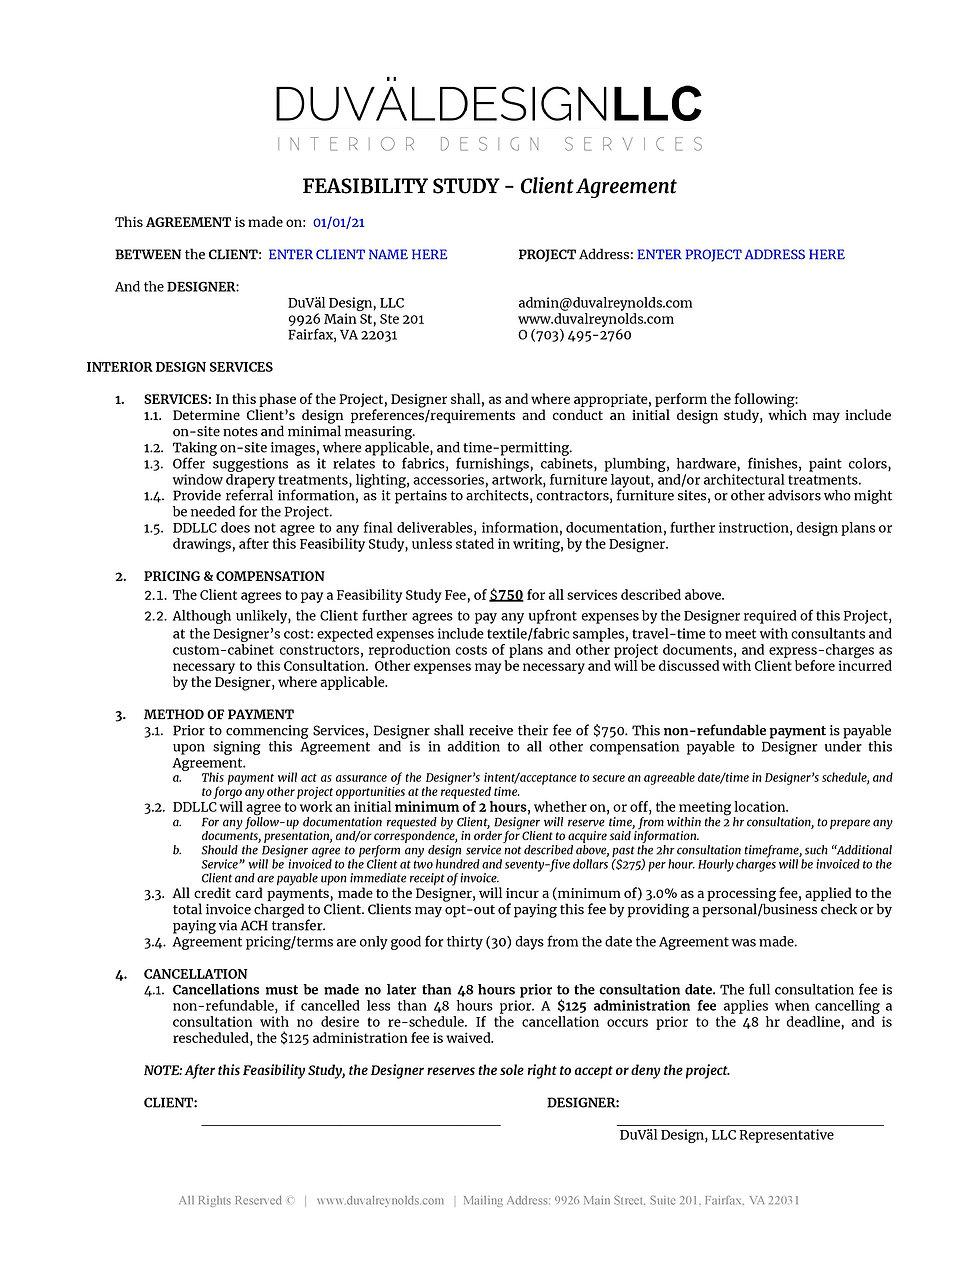 Feasibility Study - Agreement.jpg